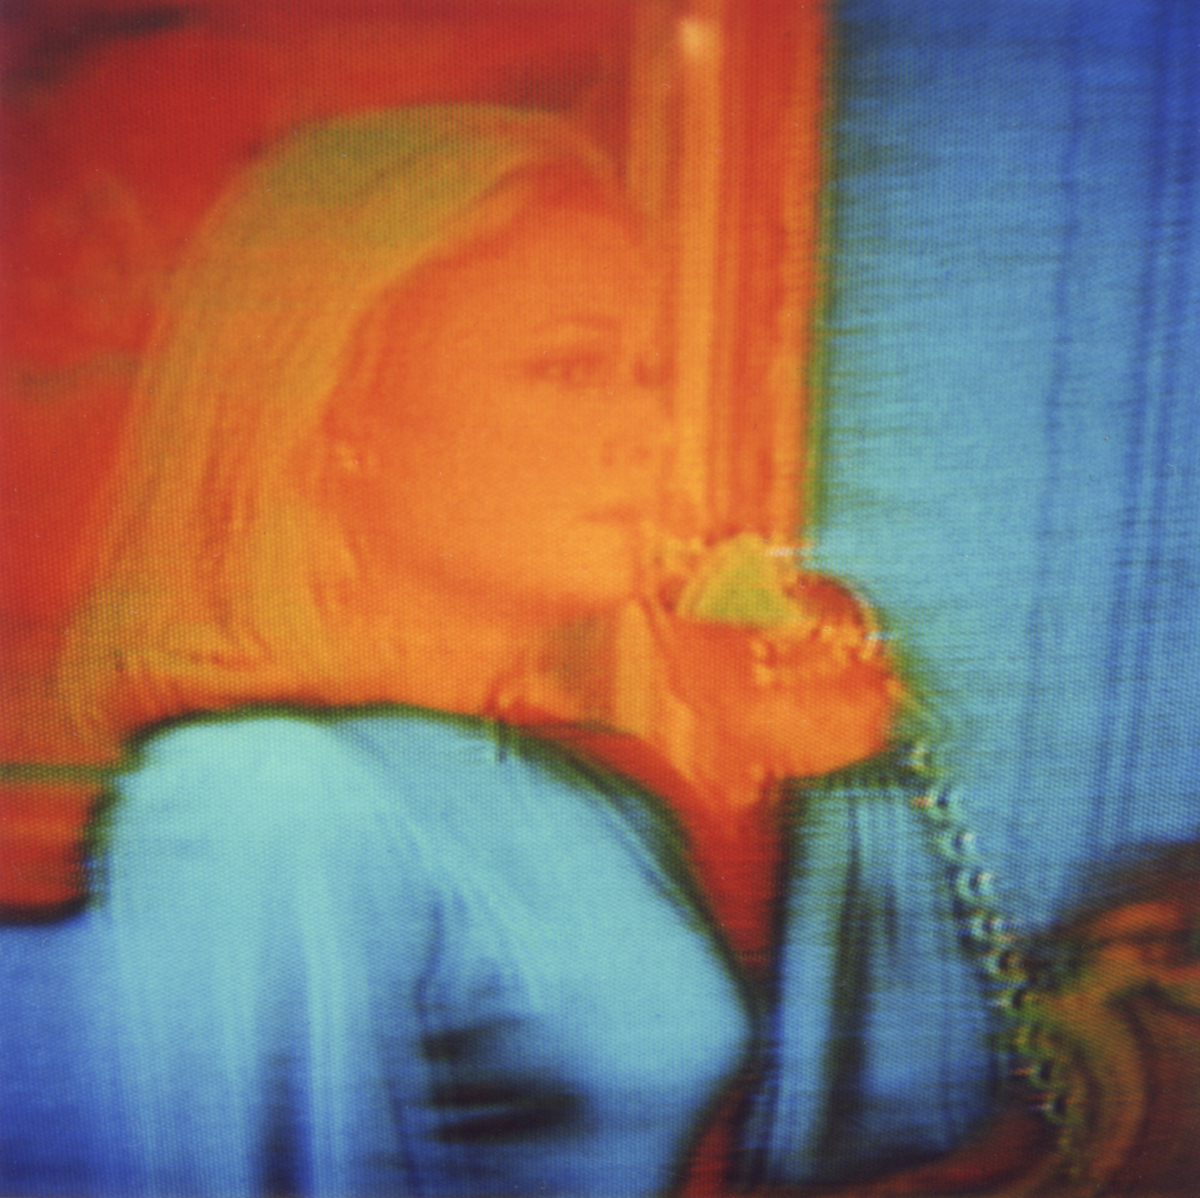 Television-TV-Polaroid-SX70-Surreal-Woman-Phone.jpg